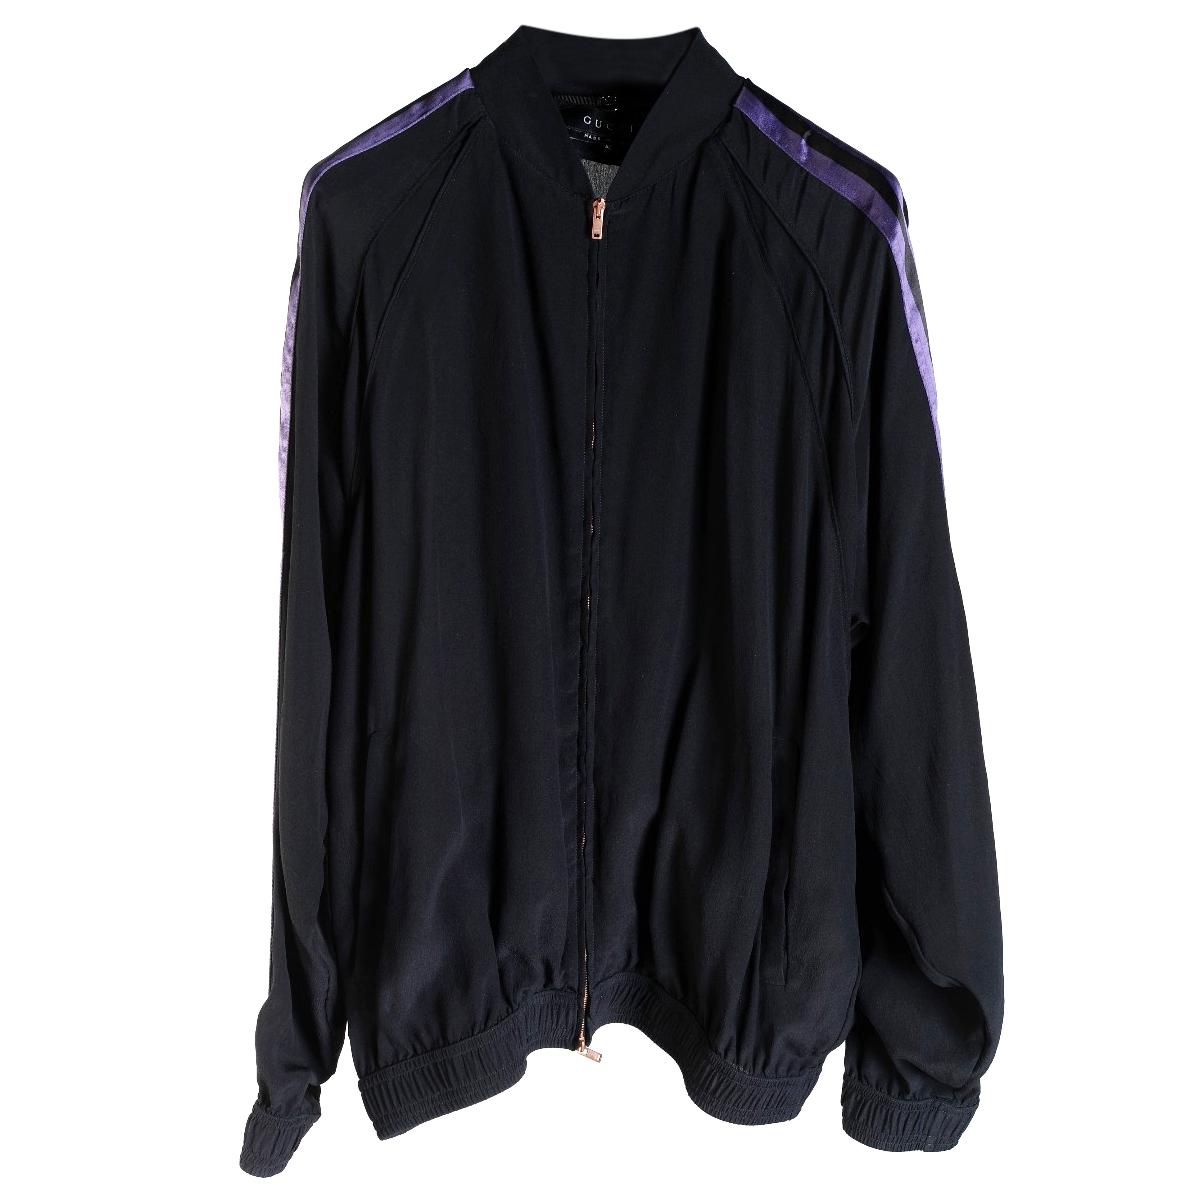 1dacb3c1c Gucci Black Silk Bomber Jacket | HEWI London